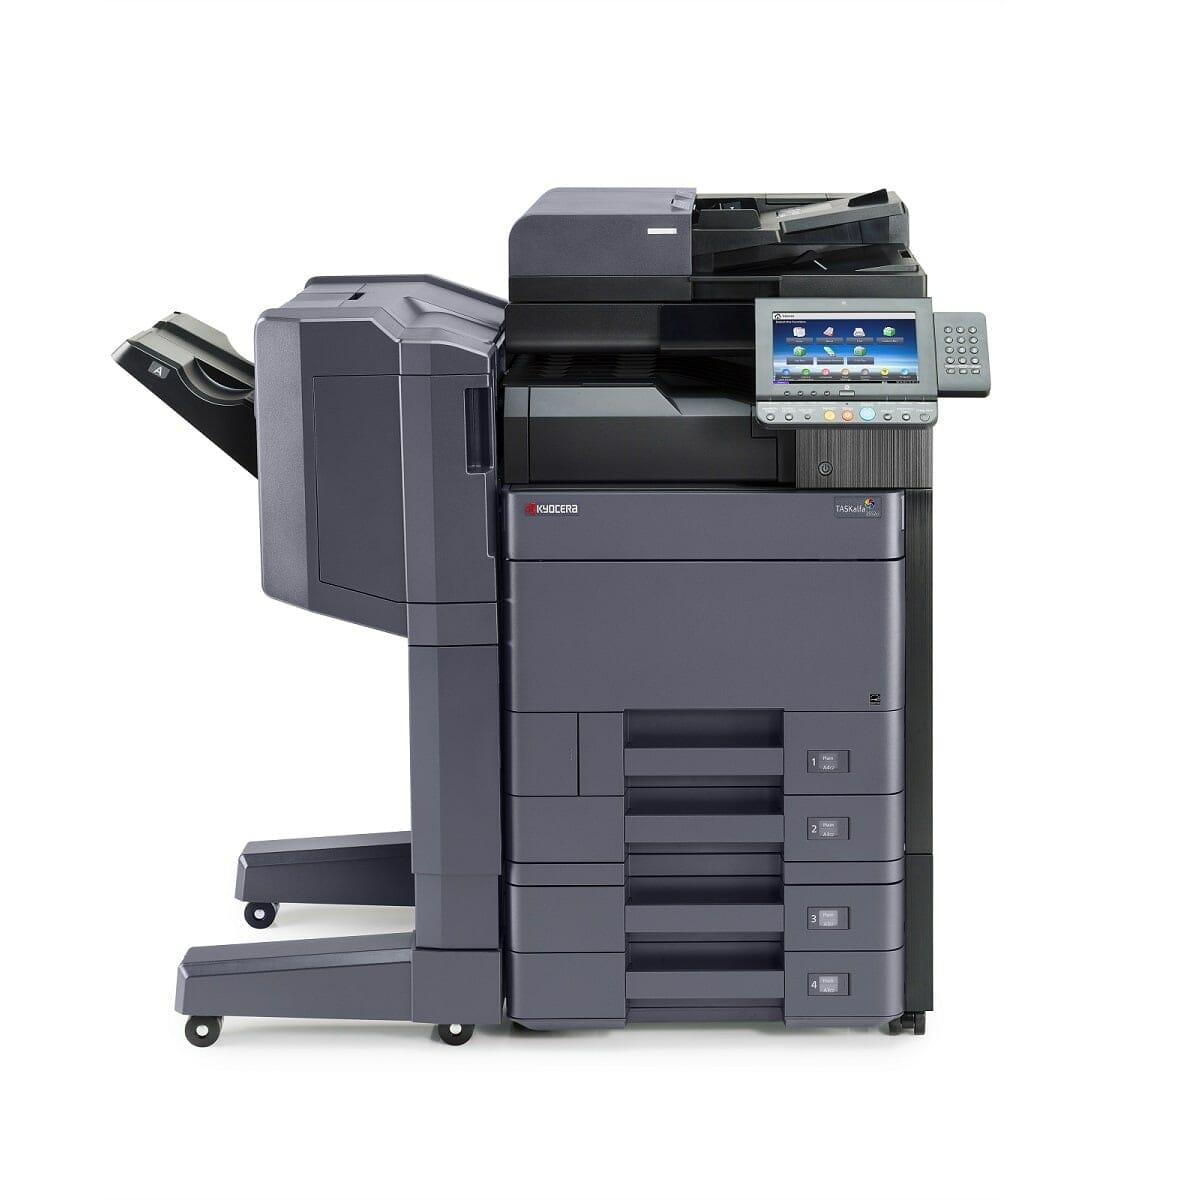 Kyocera TASKalfa 4052ci - Global Document Solutions